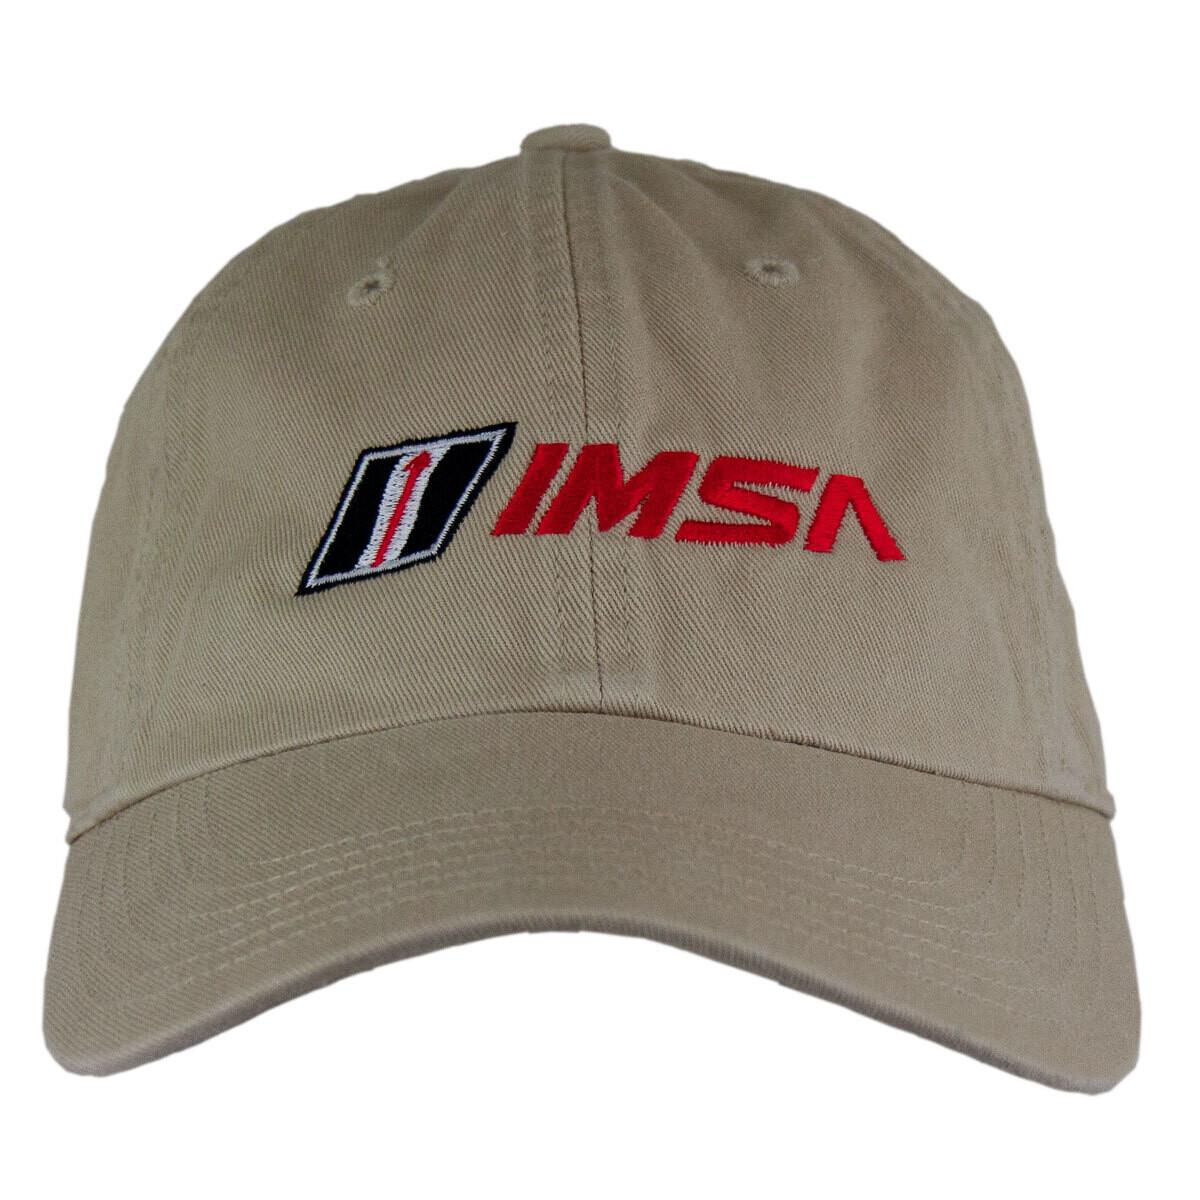 IMSA Dad Washed Hat - Stone